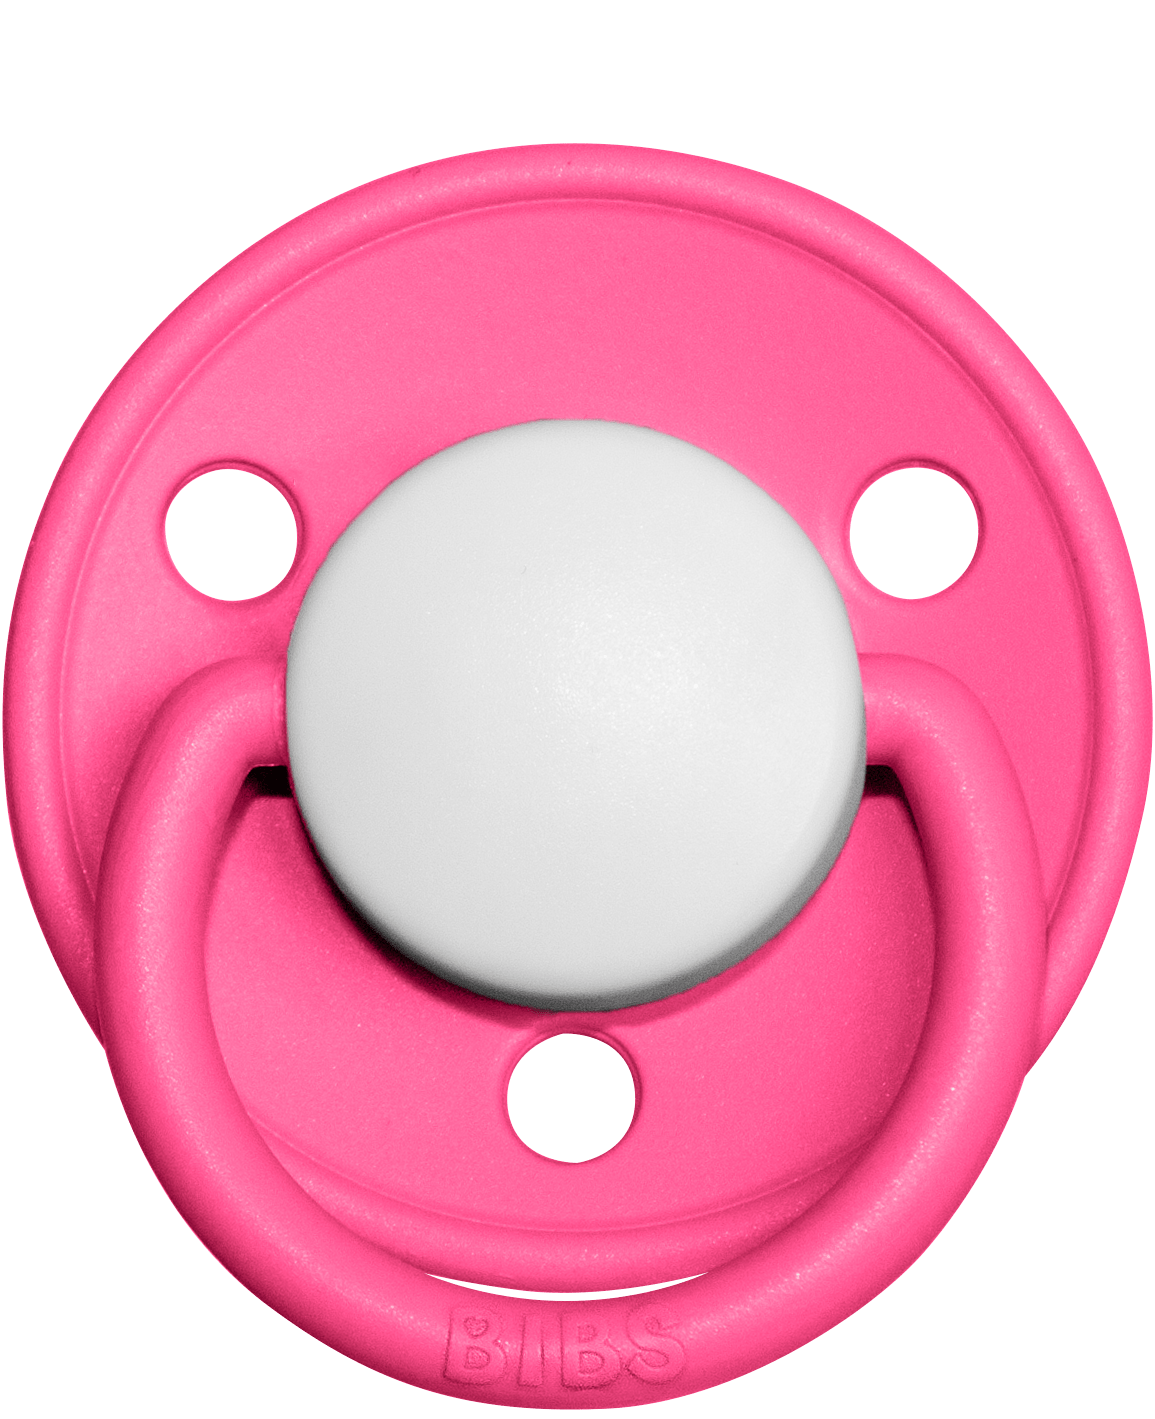 Raspberry-30 - Silicone